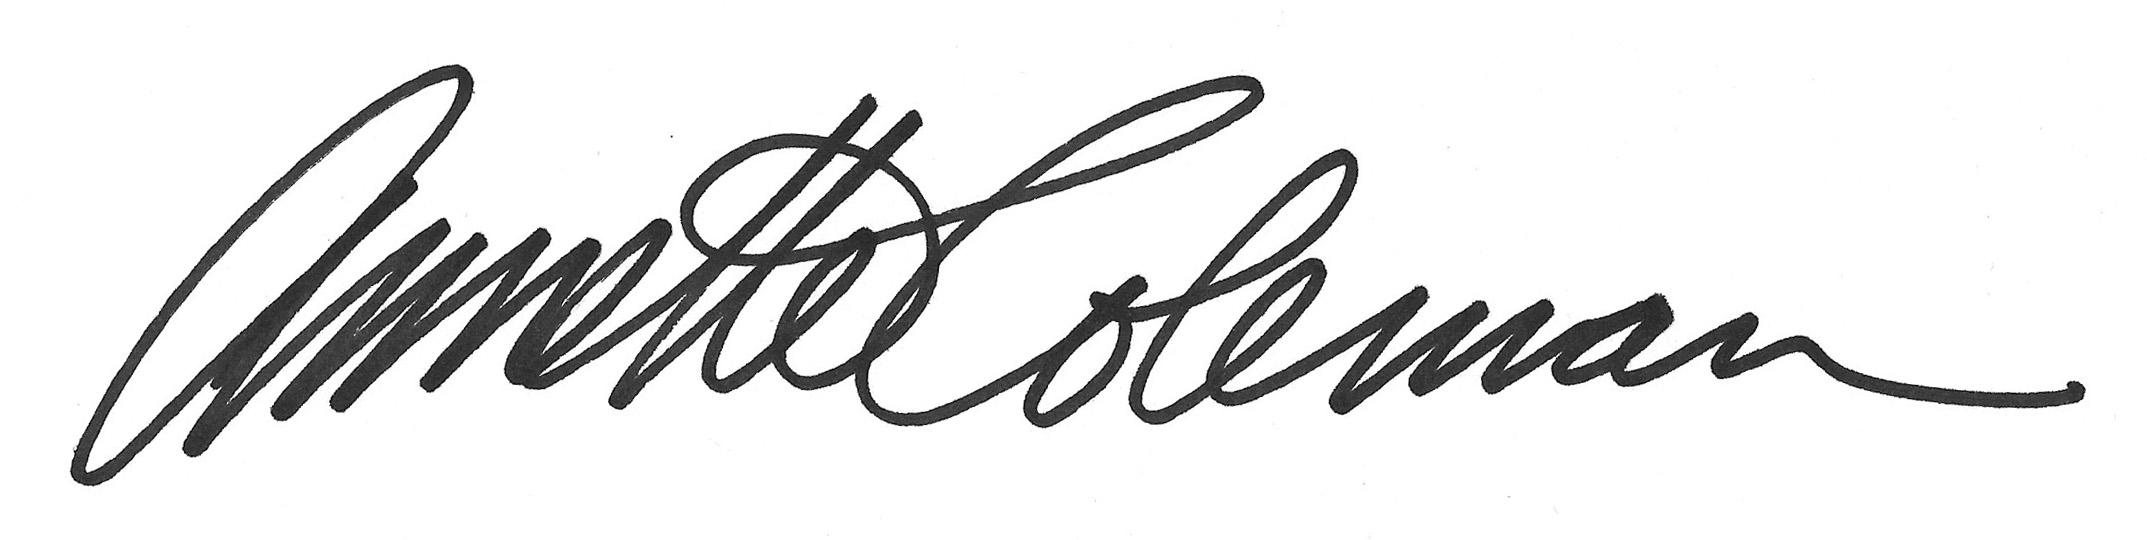 Annette Coleman Signature